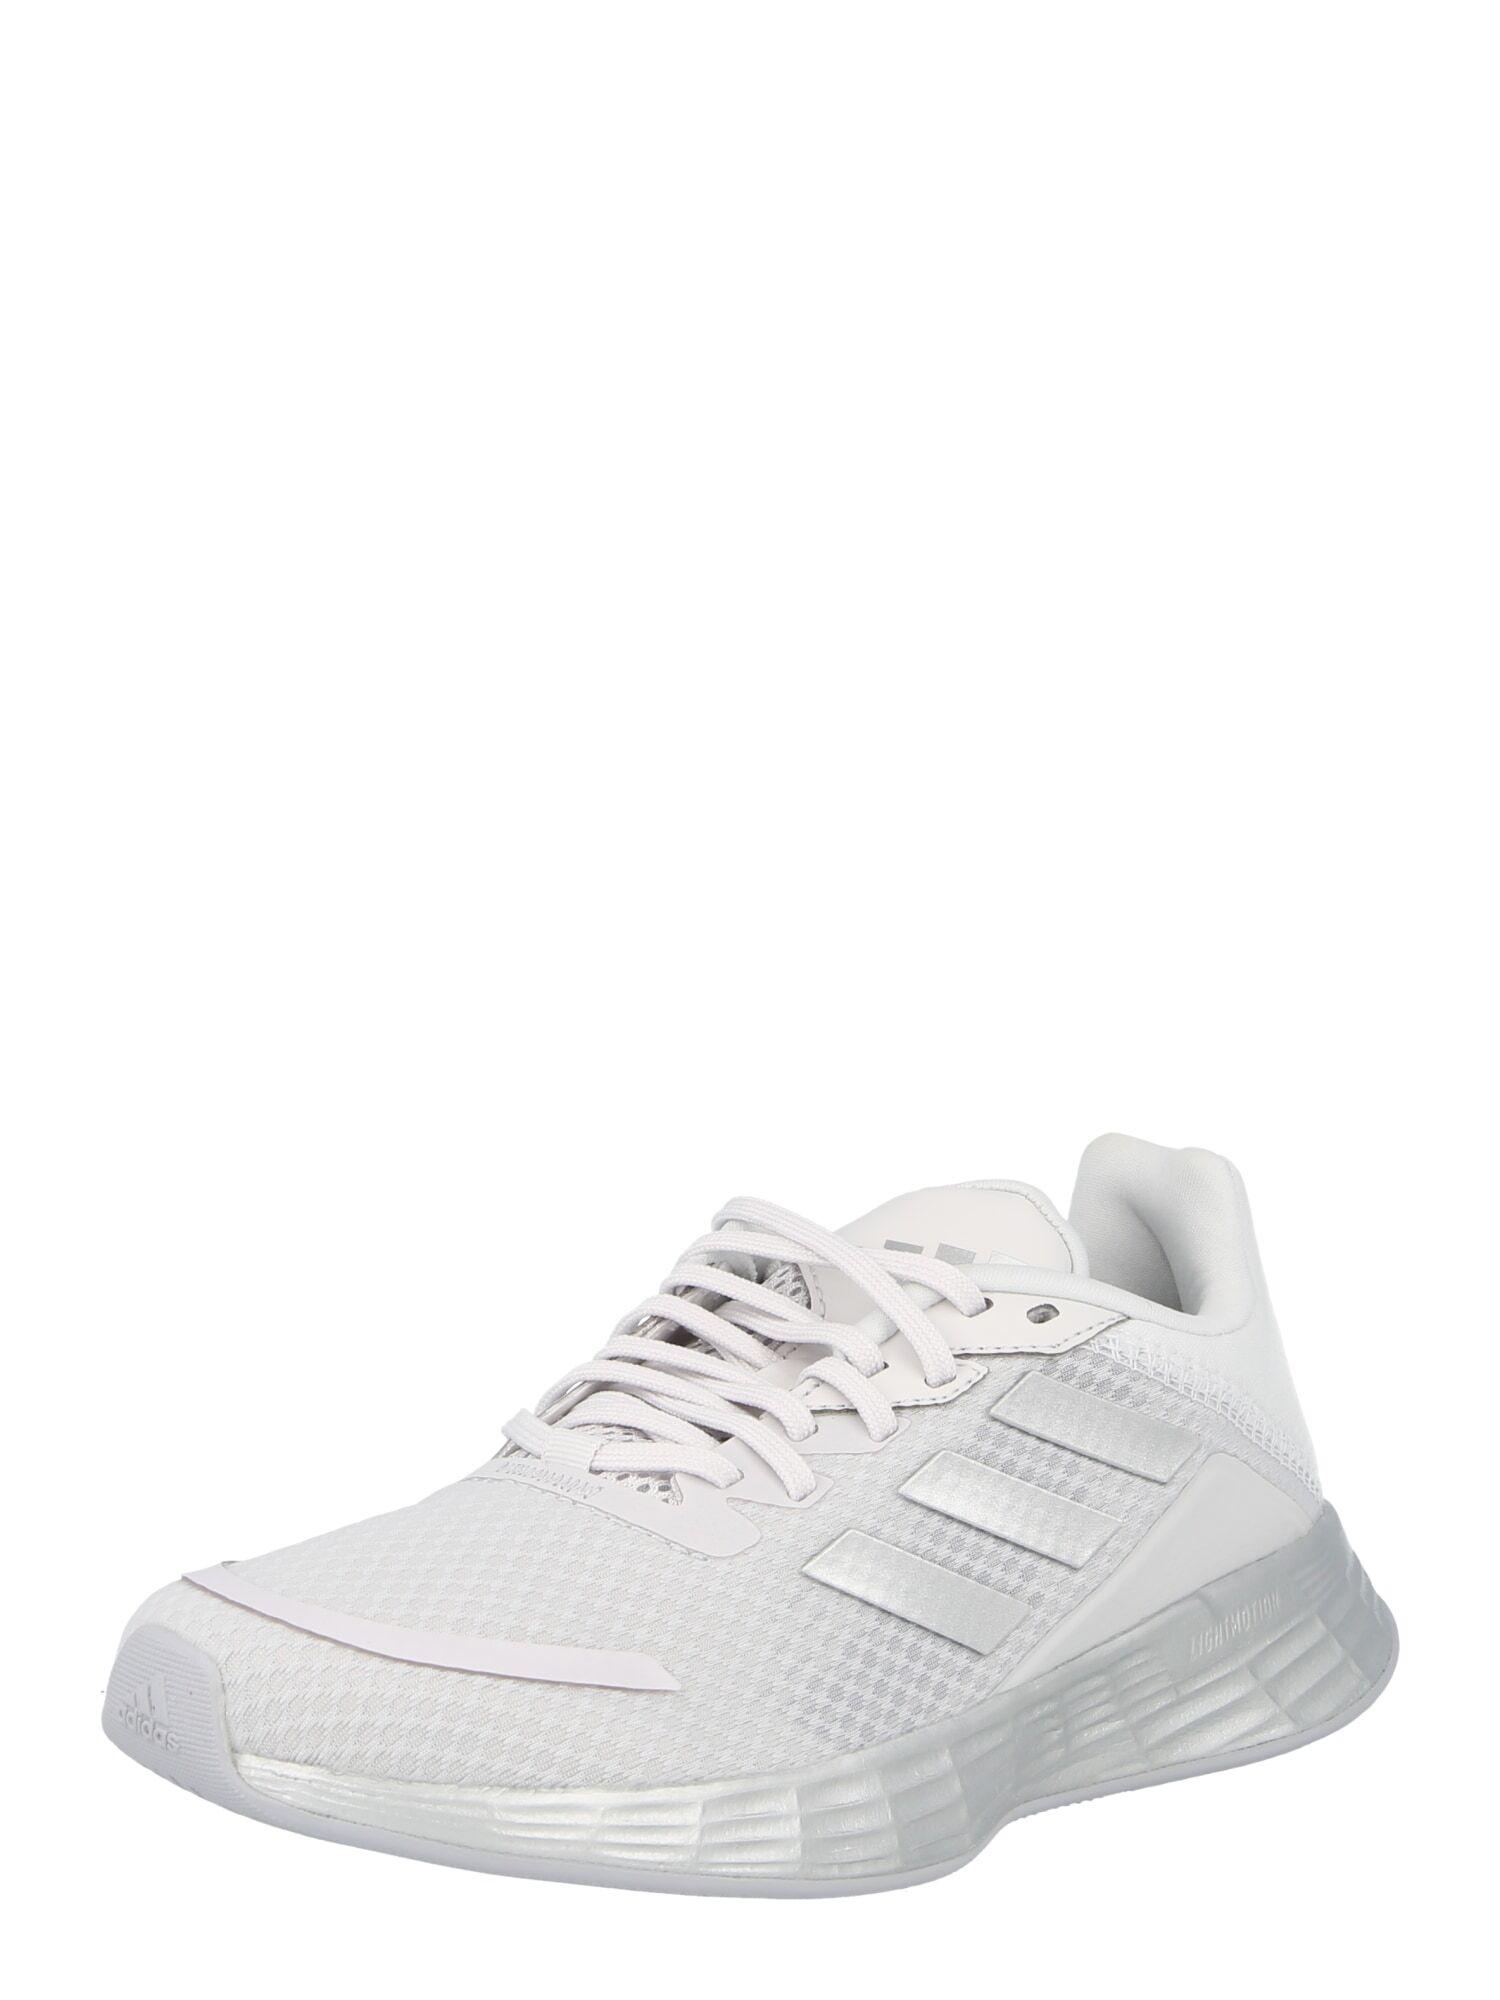 ADIDAS PERFORMANCE Chaussure de course 'Duramo'  - Blanc - Taille: 6 - female